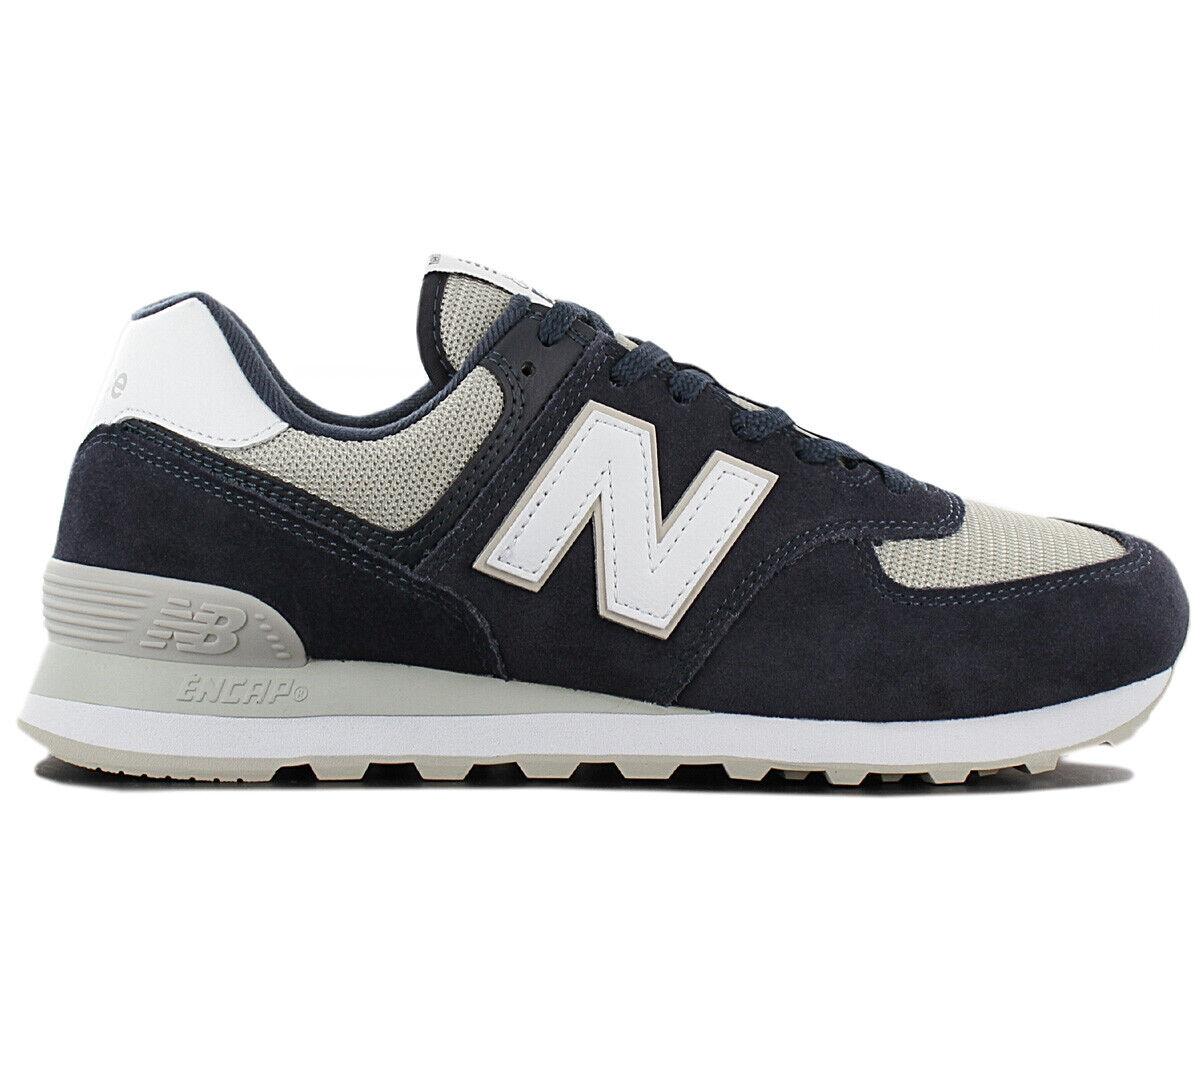 New Balance Classics 574 Men's Sneakers shoes Ml574esq Trainers Sport shoes